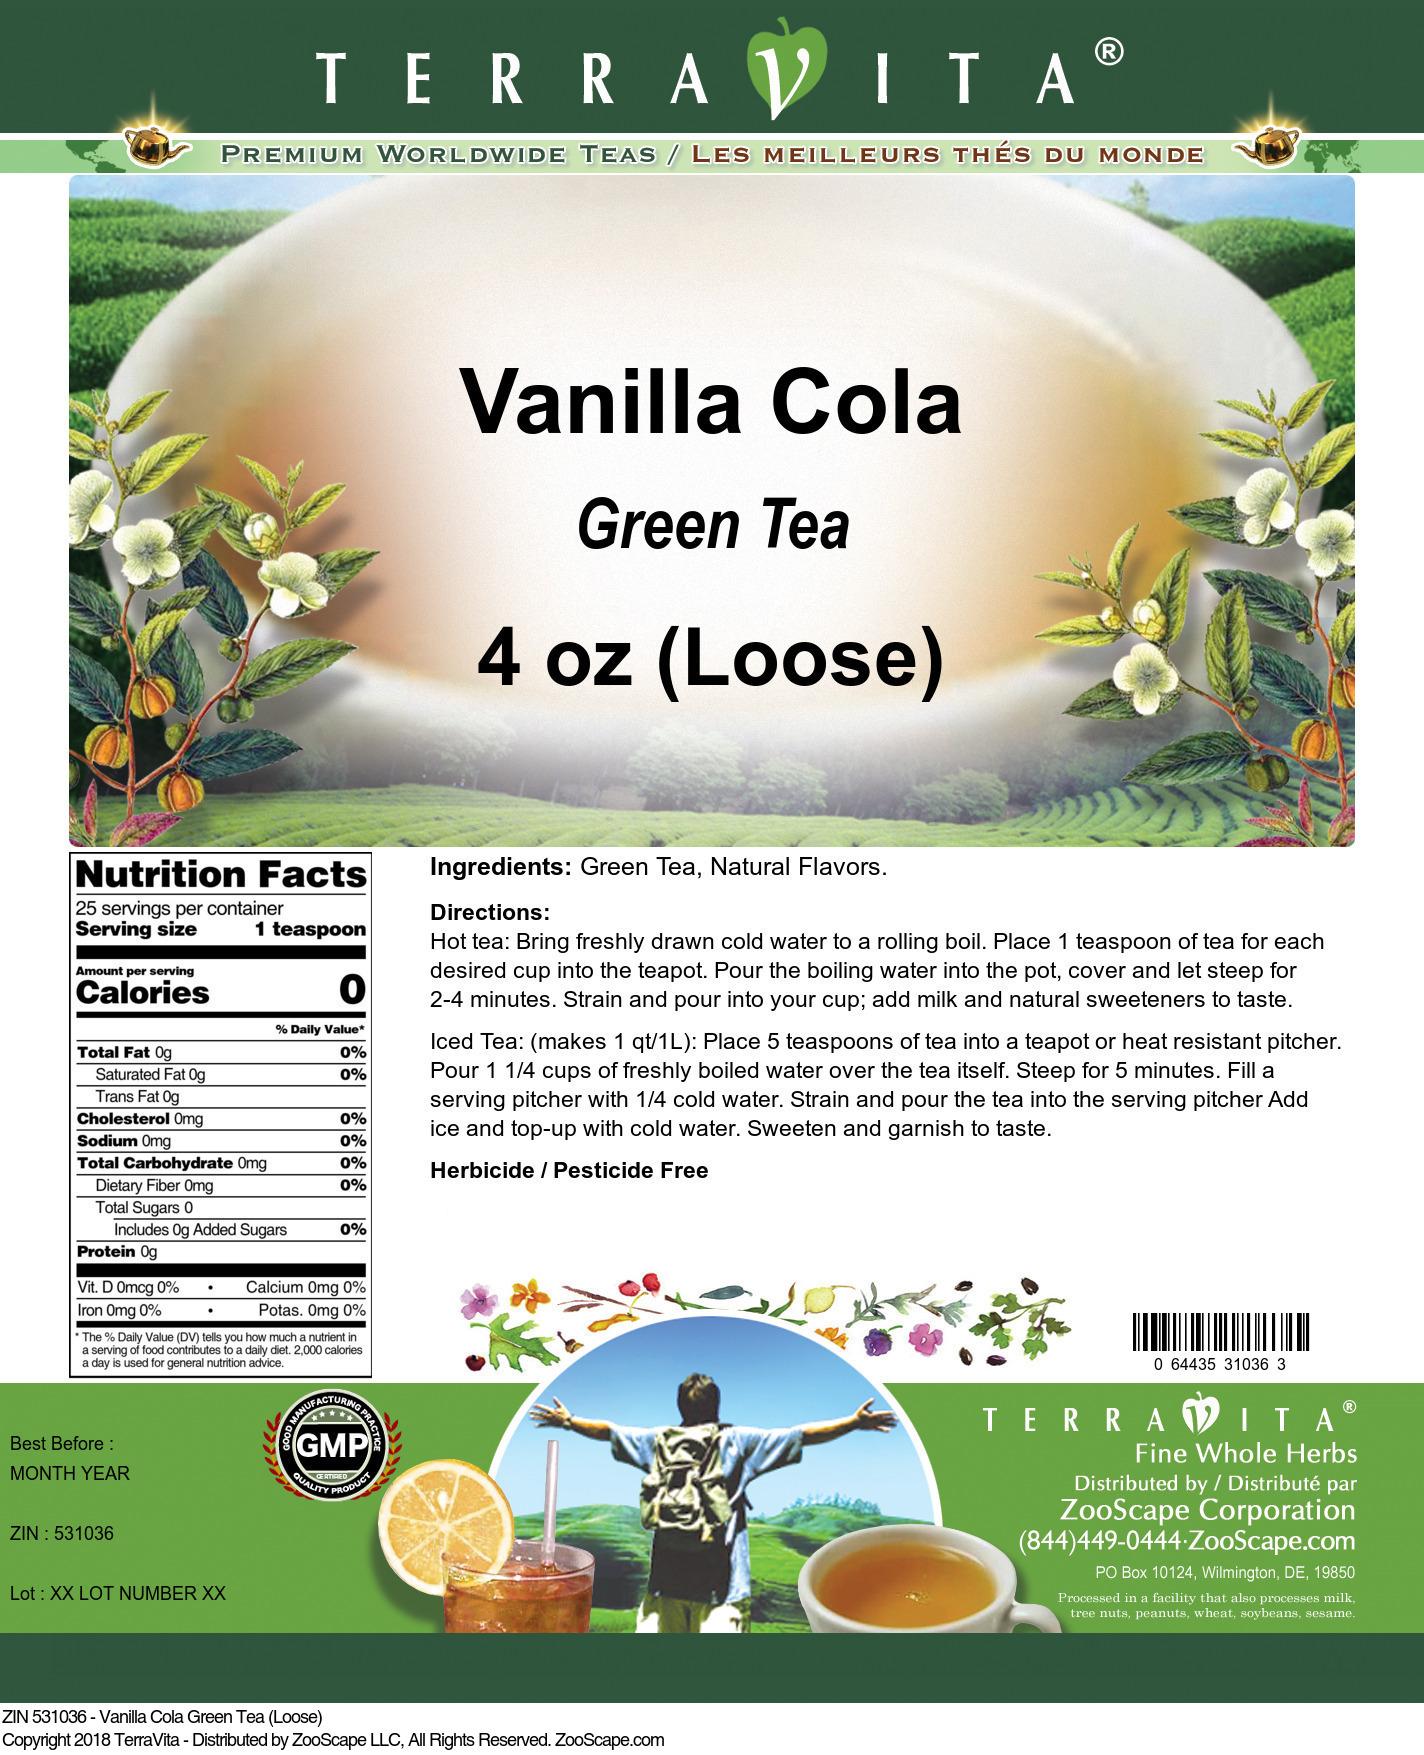 Vanilla Cola Green Tea (Loose)